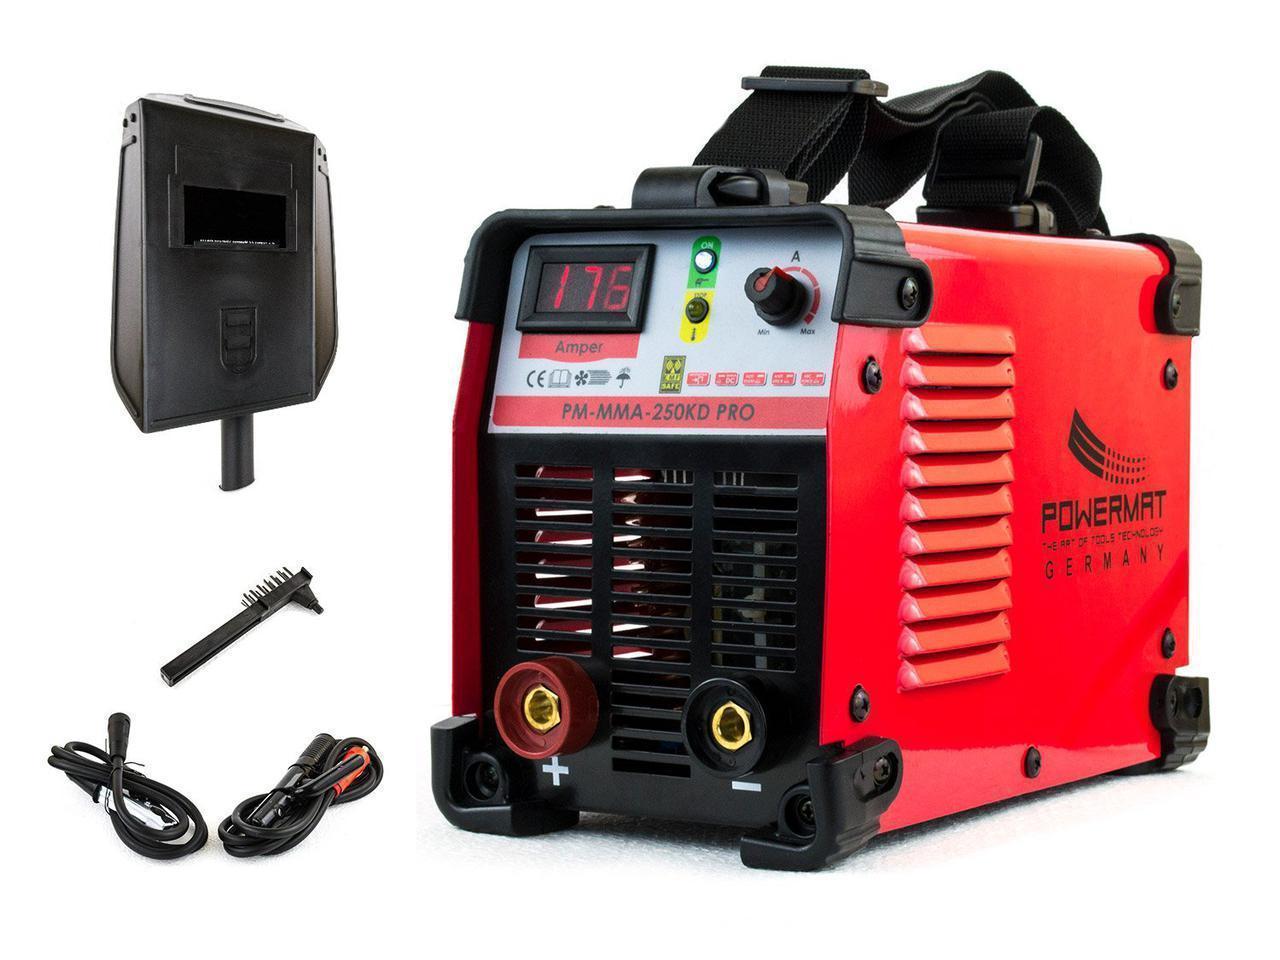 Сварочный аппарат POWERMAT PM-MMA-250KD PRO